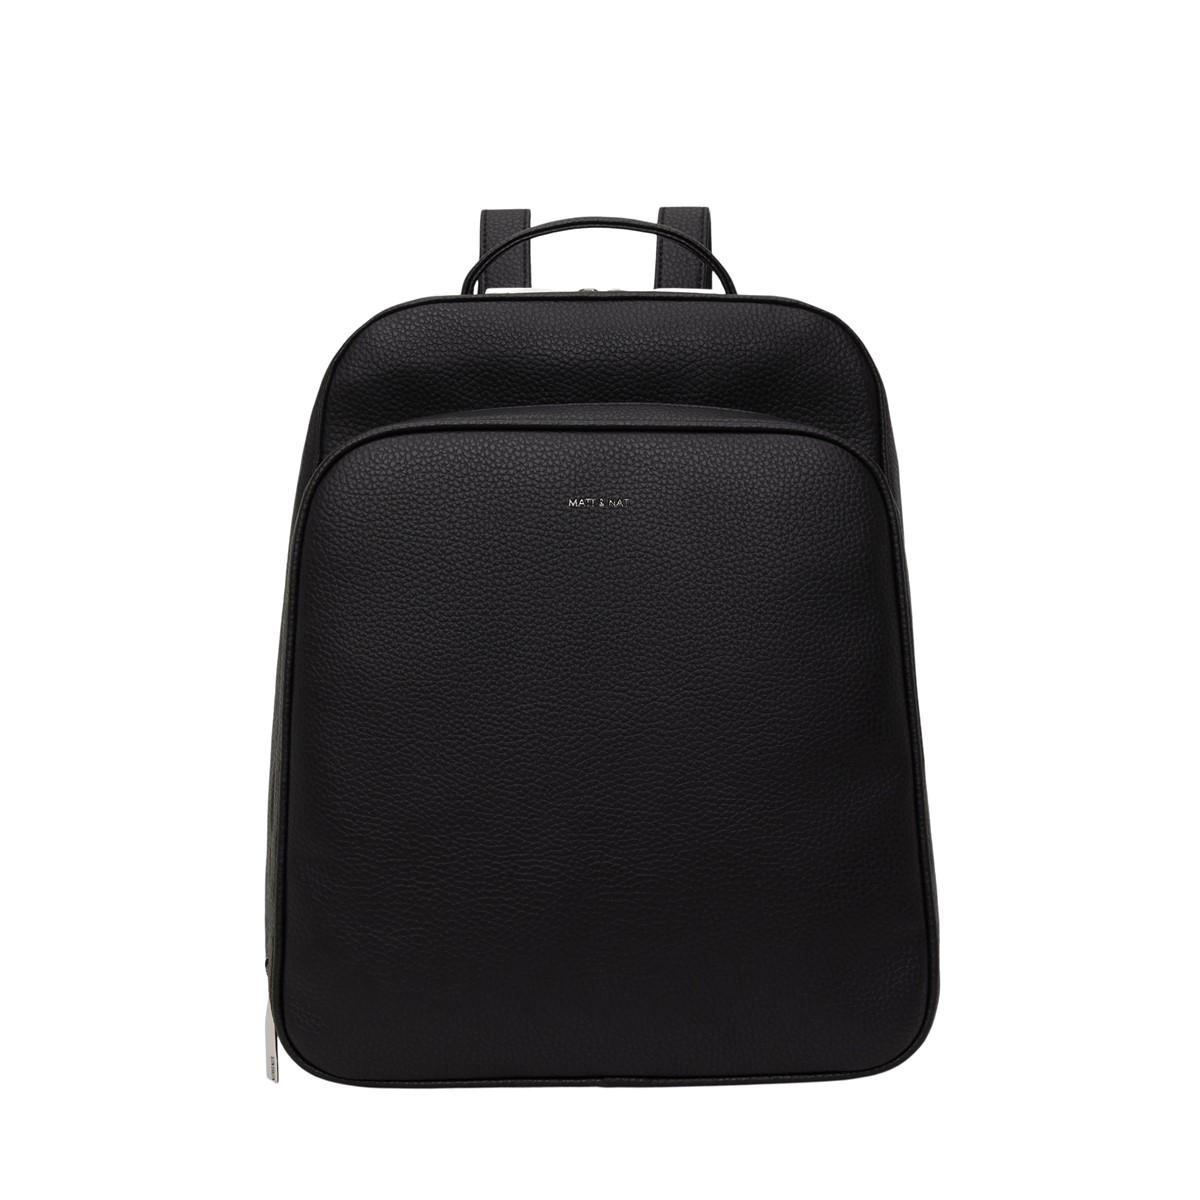 Nava Purity Backpack in Black